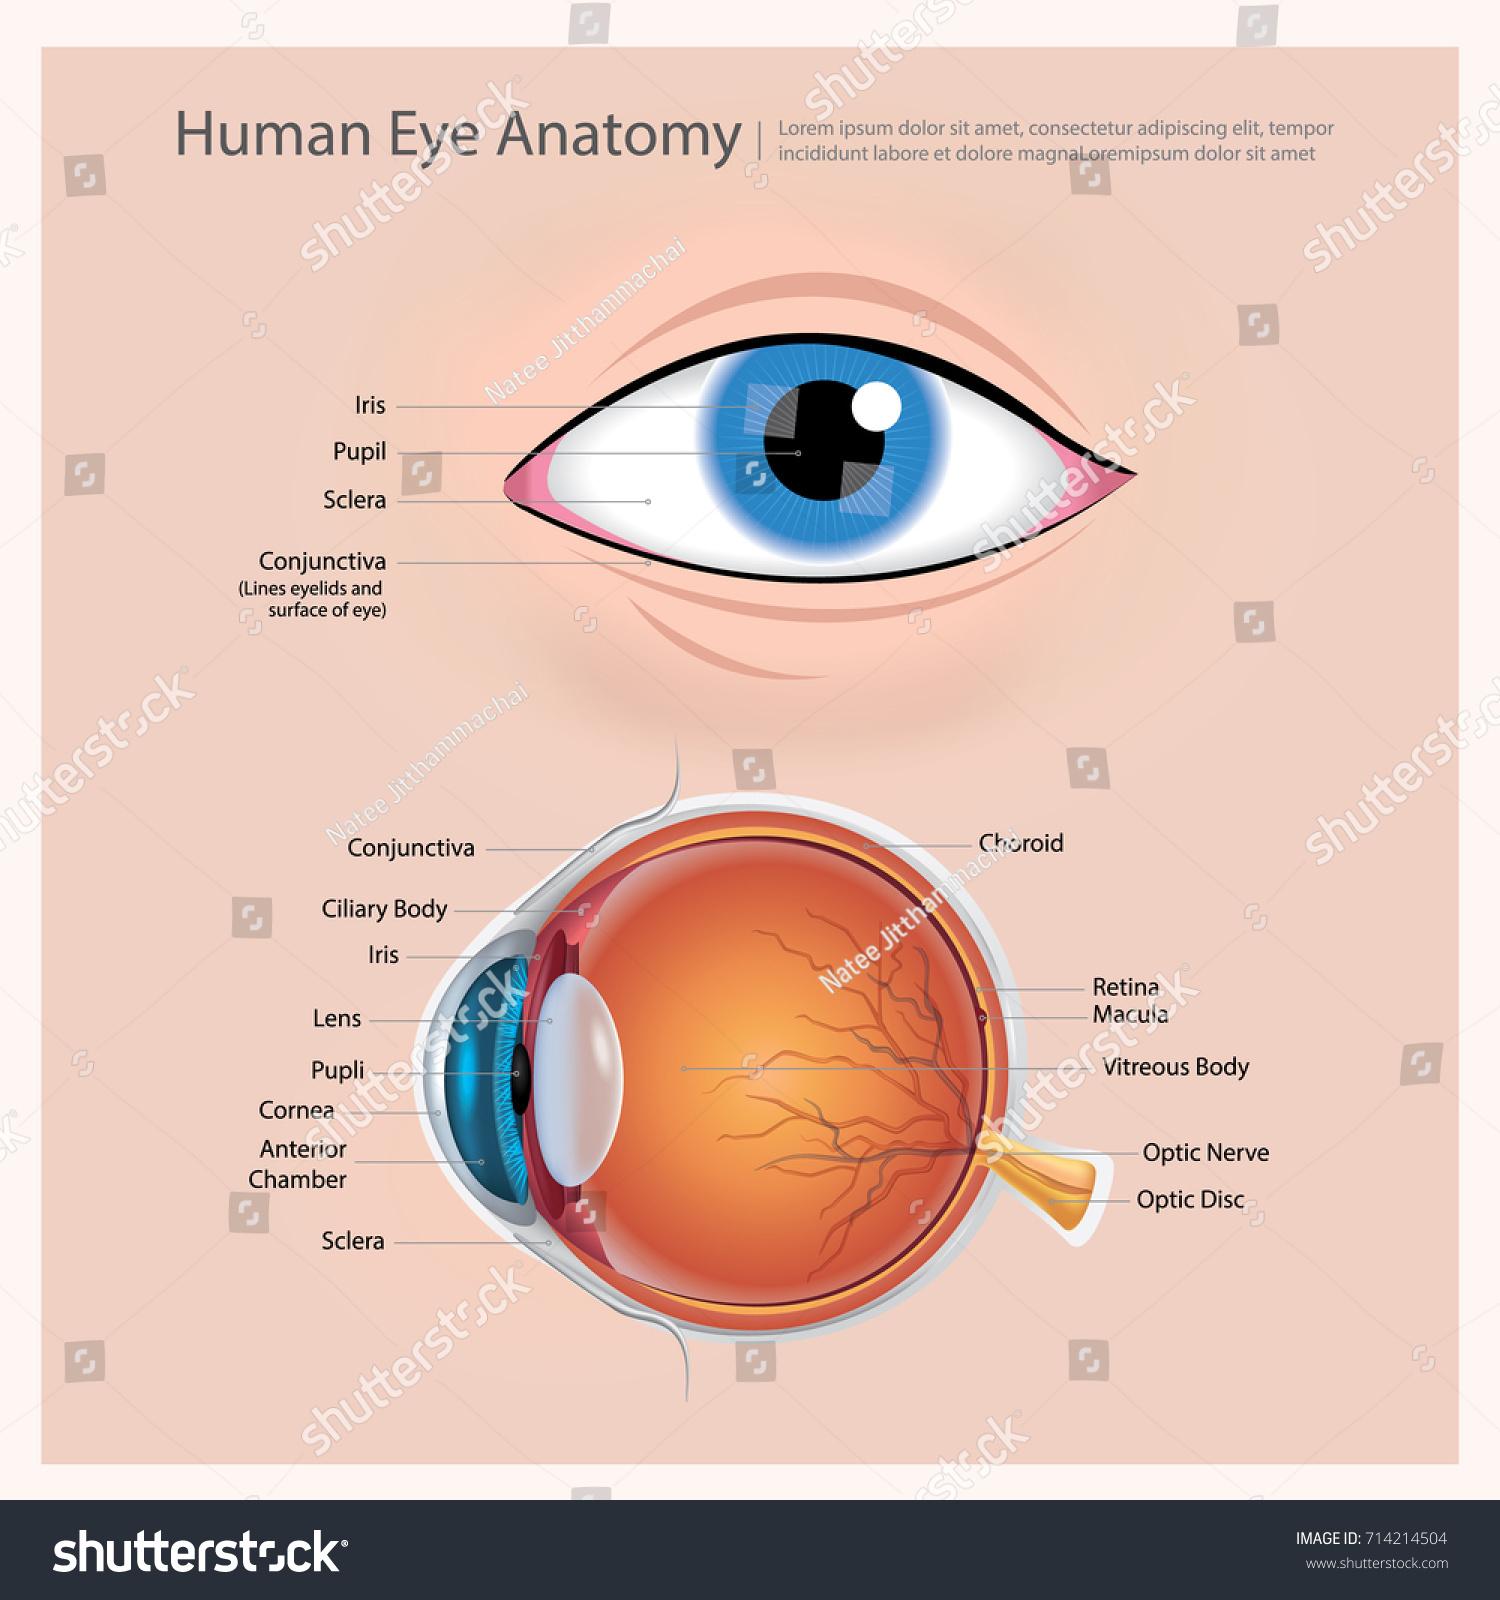 Human Eye Anatomy Vector Illustration Stock Vector 714214504 ...